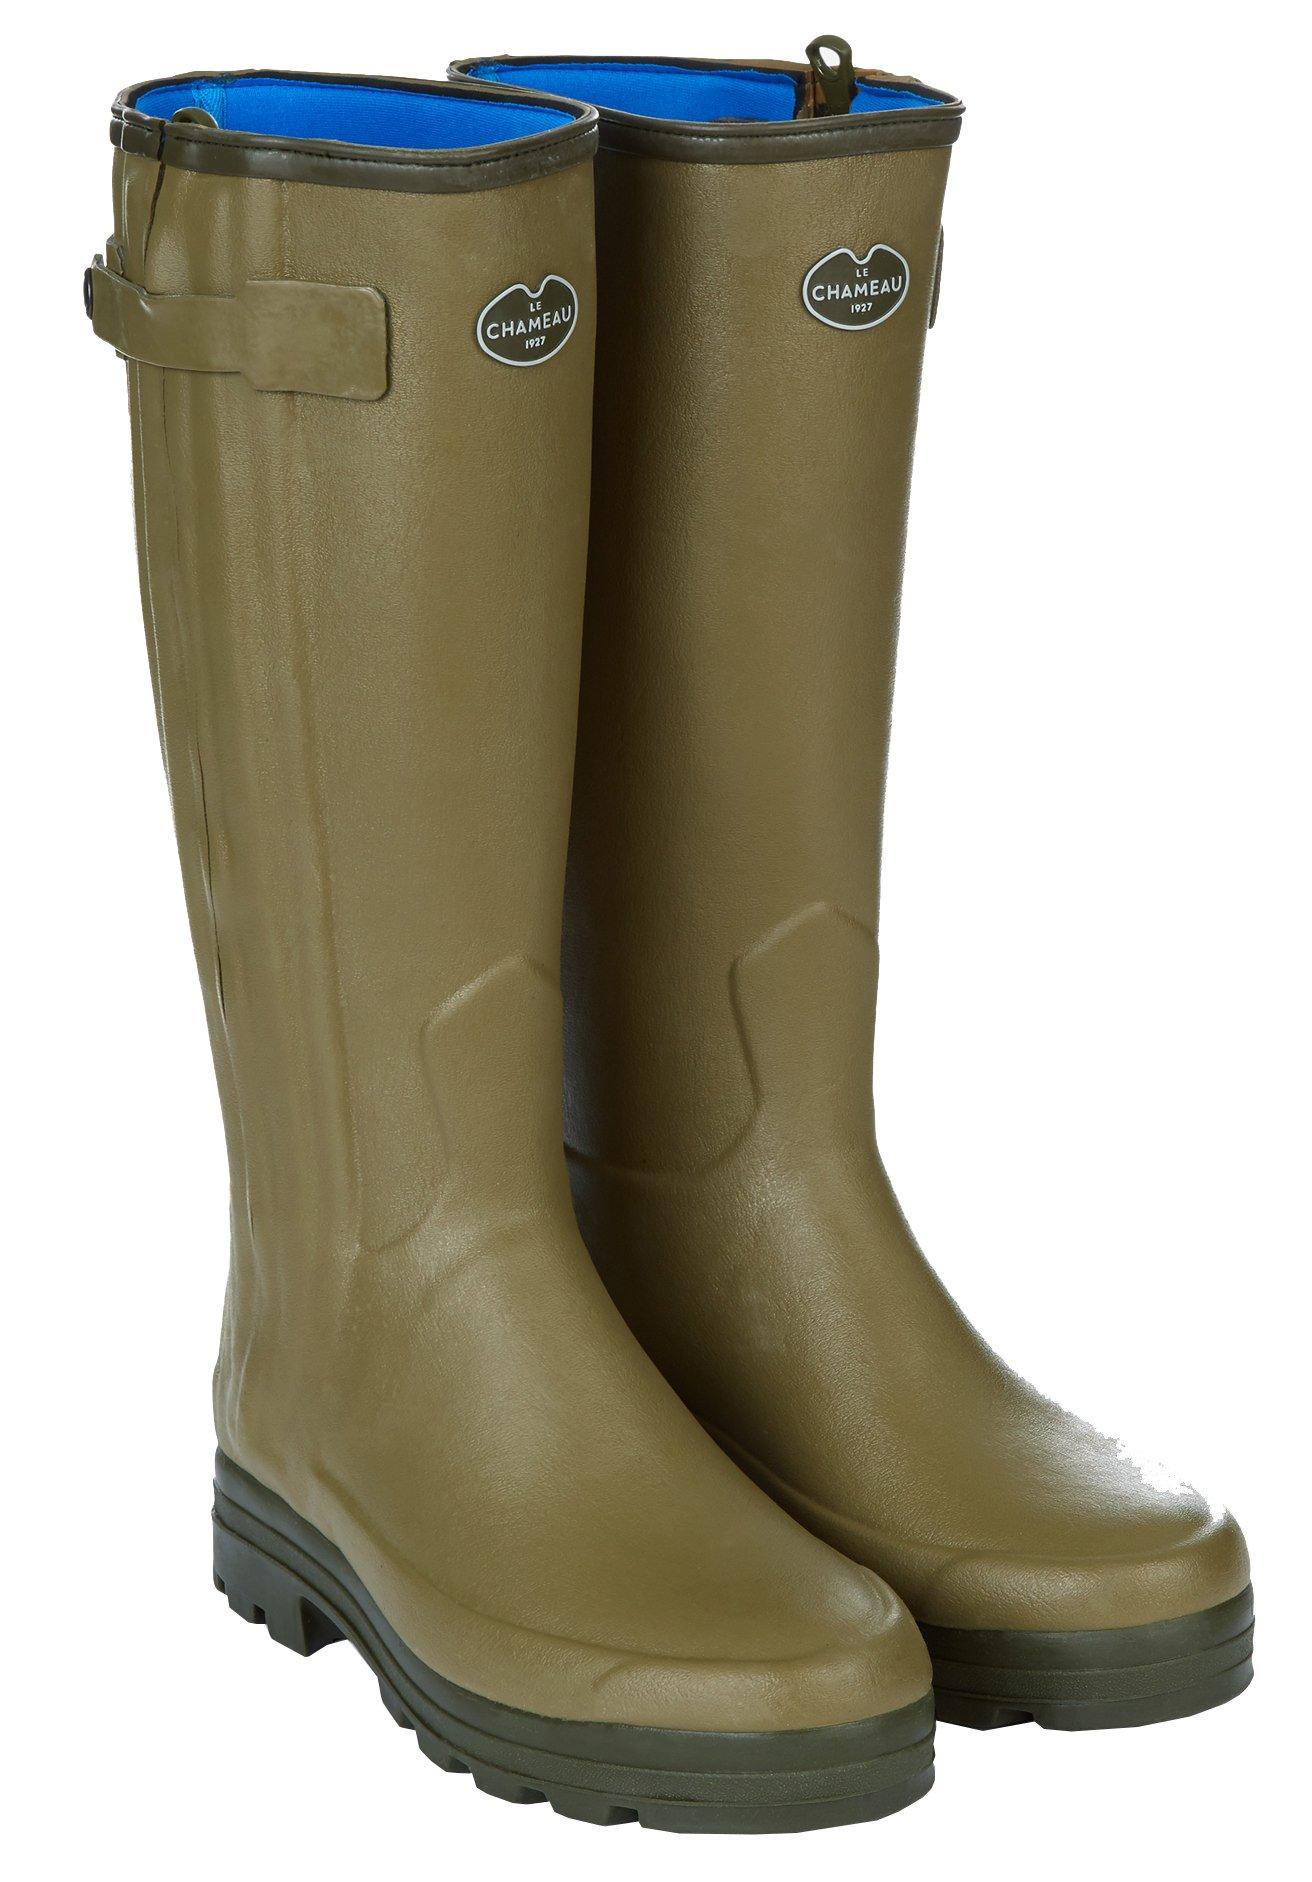 LE CHAMEAU 1927 Men's Chasseur Neoprene Lined Boot NÉO W - US 12 (Calf 41cm) Green